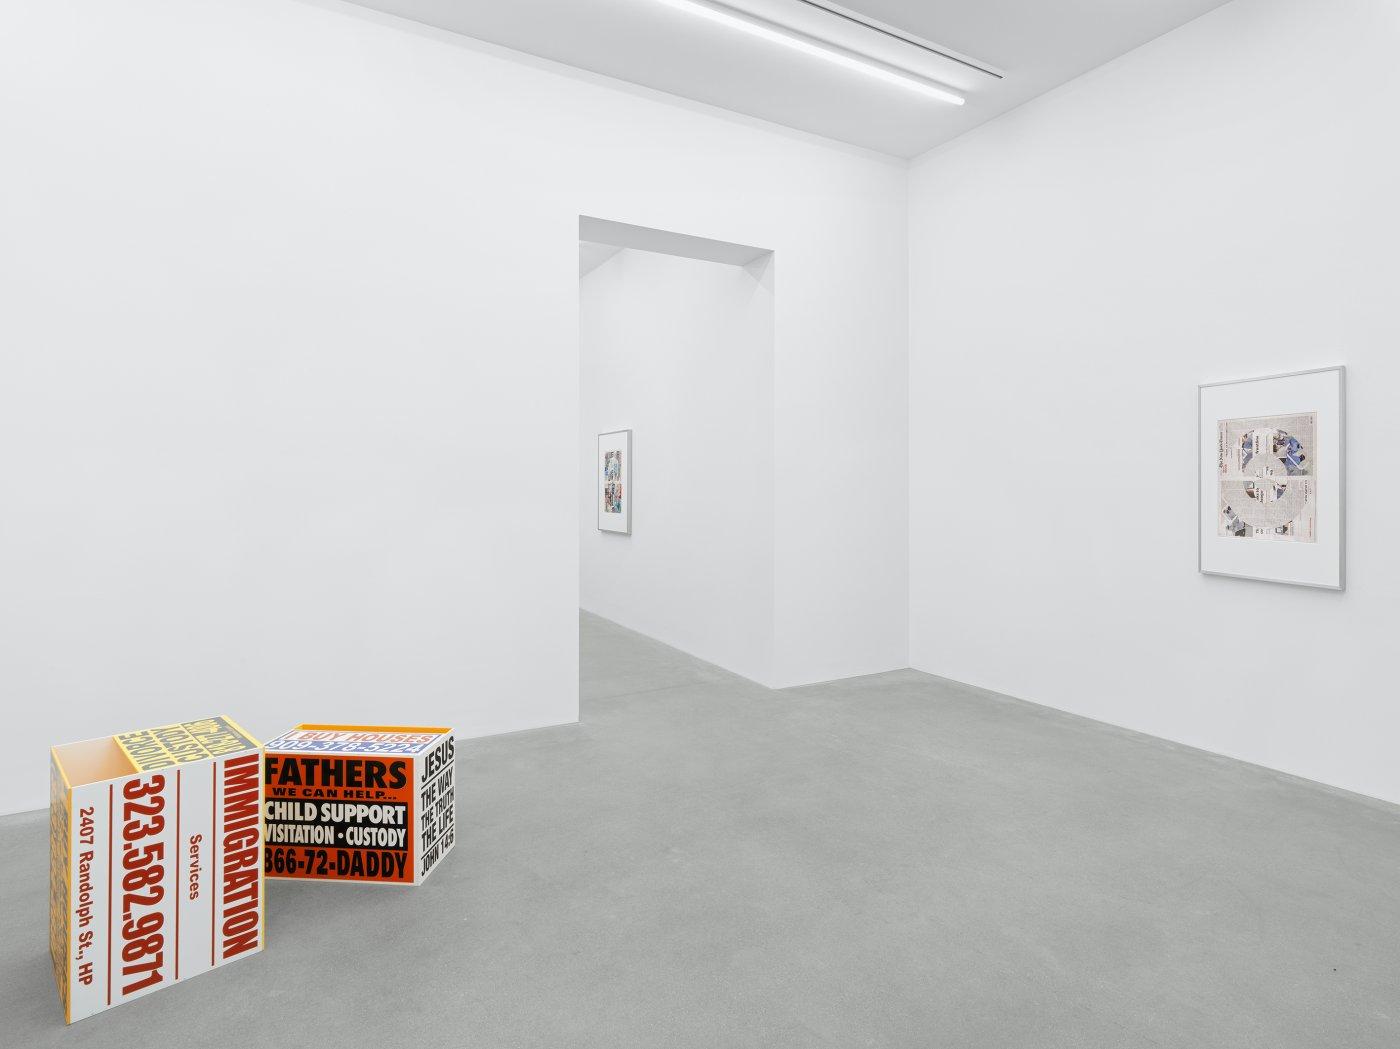 Galerie Eva Presenhuber Waldmanstrasse Walead Beshty 10